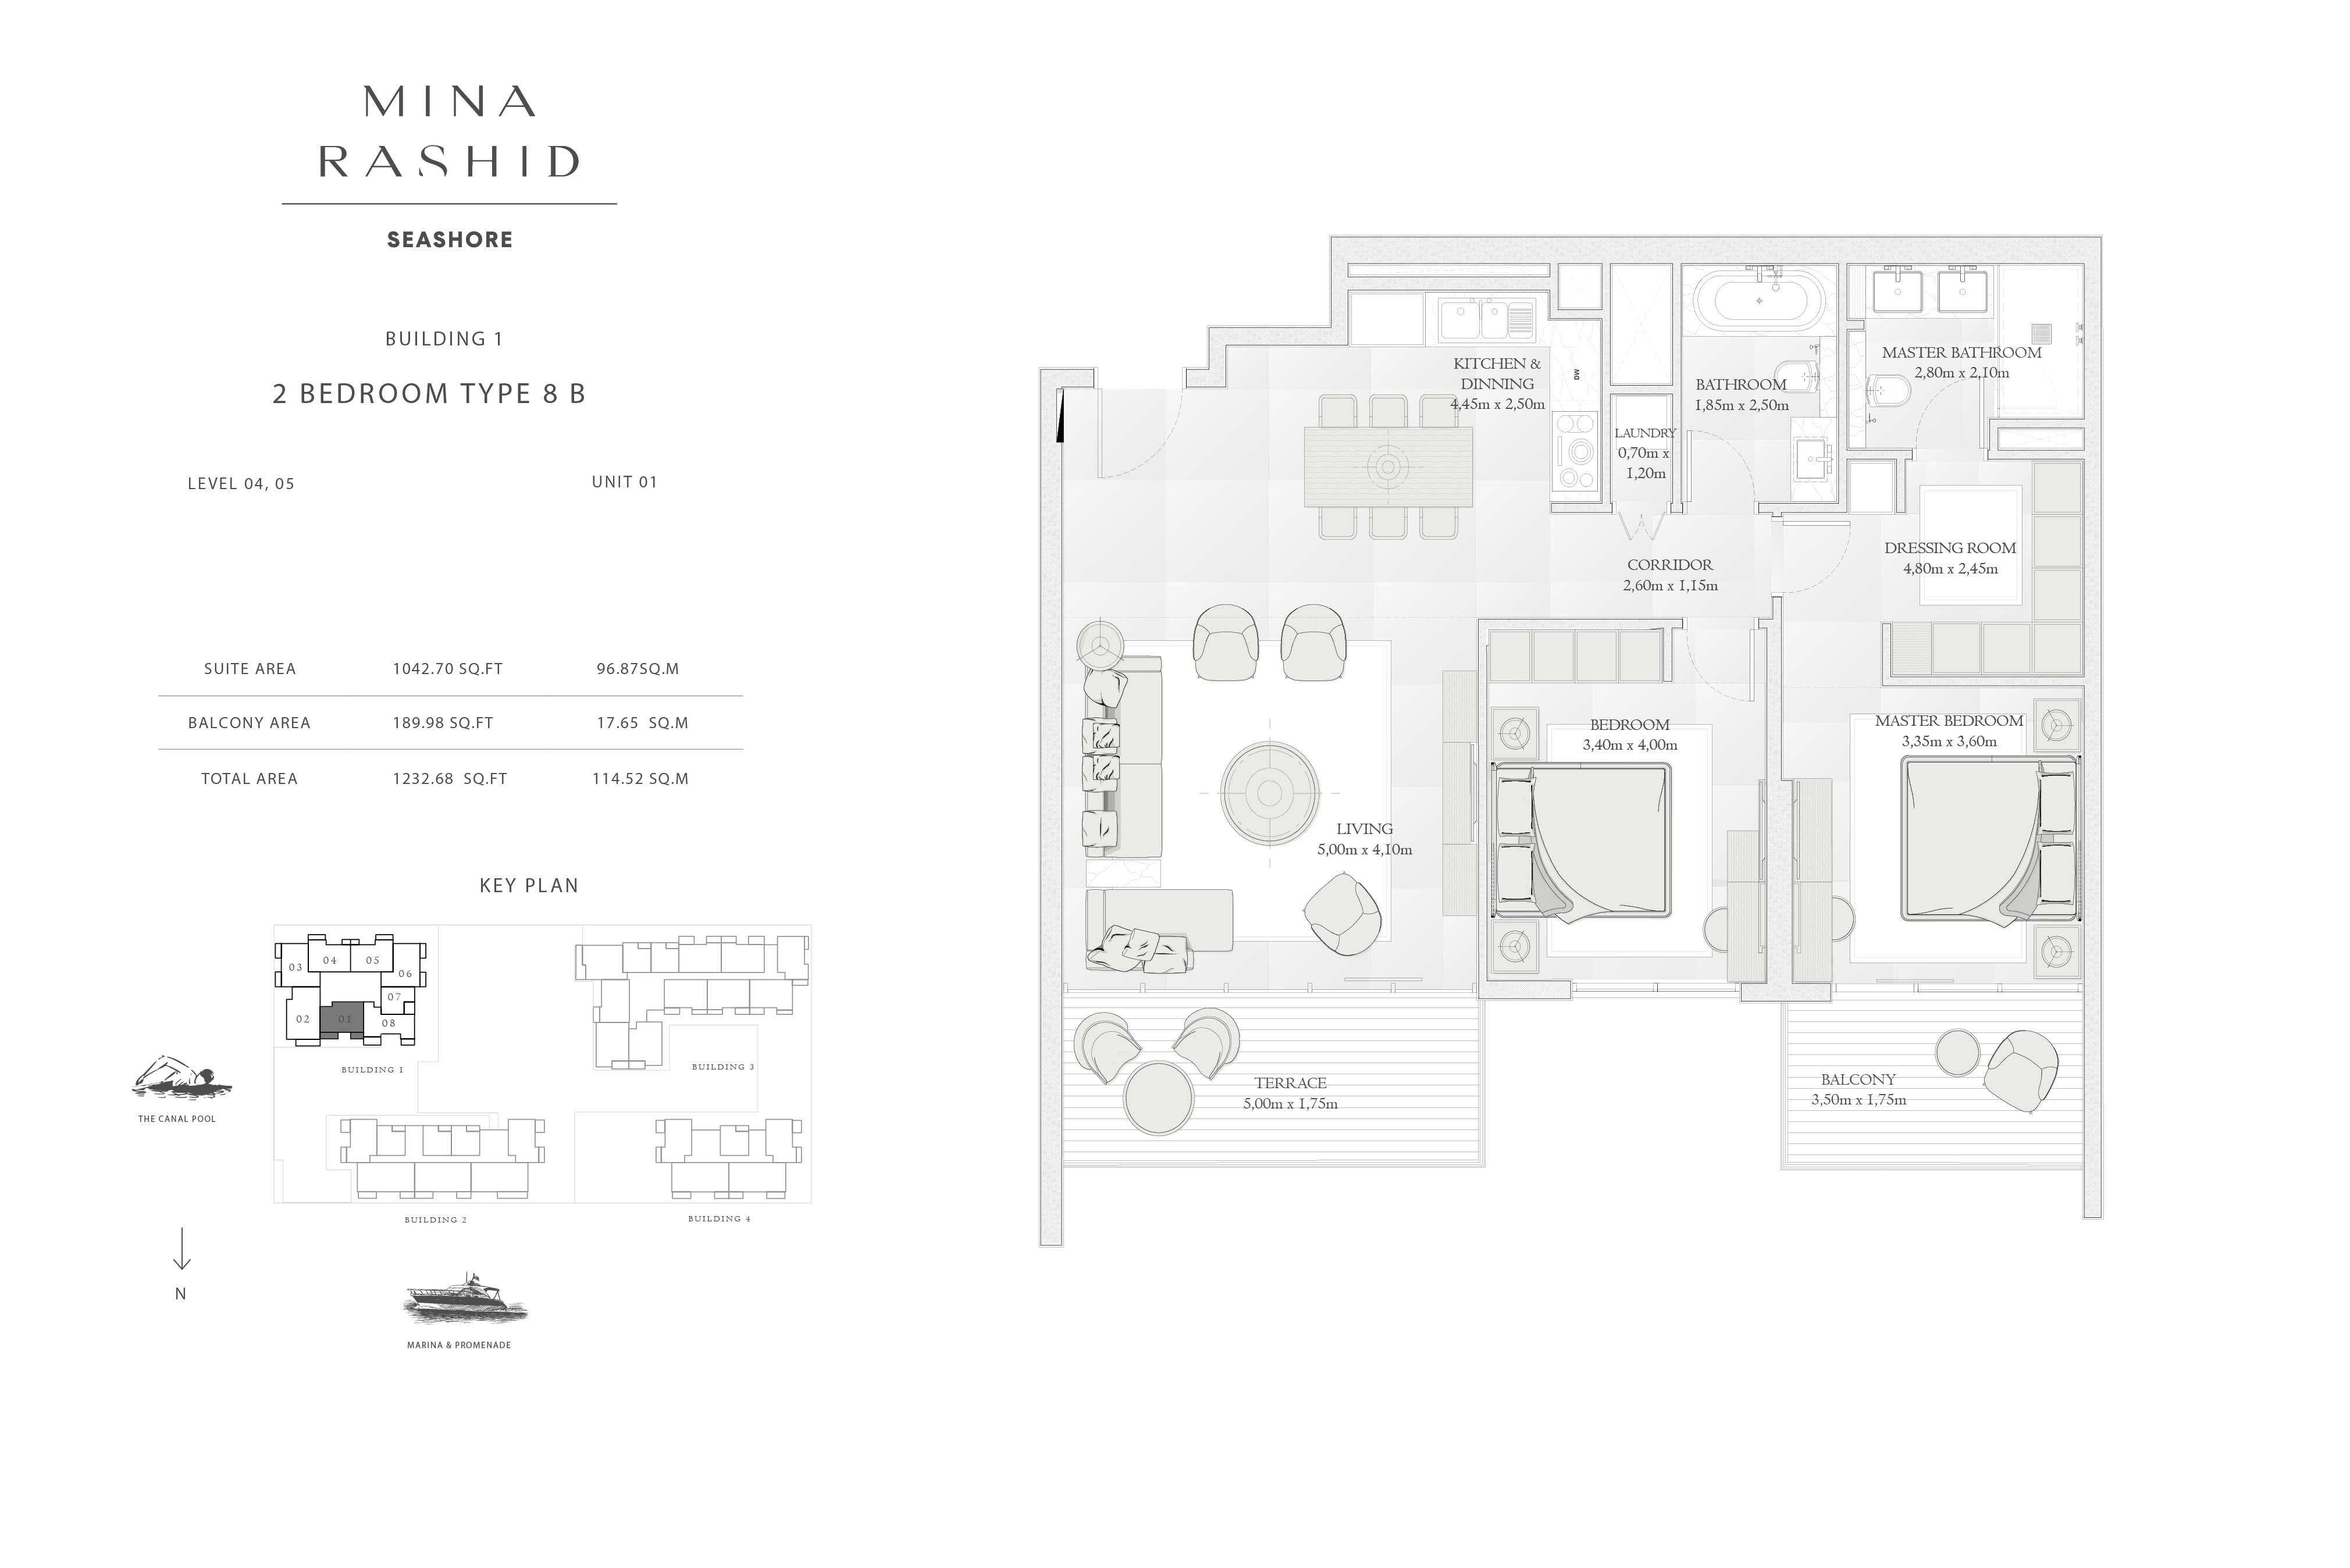 Building-1, 2-Bedroom-Type-8B, Size-1232-Sq-Ft